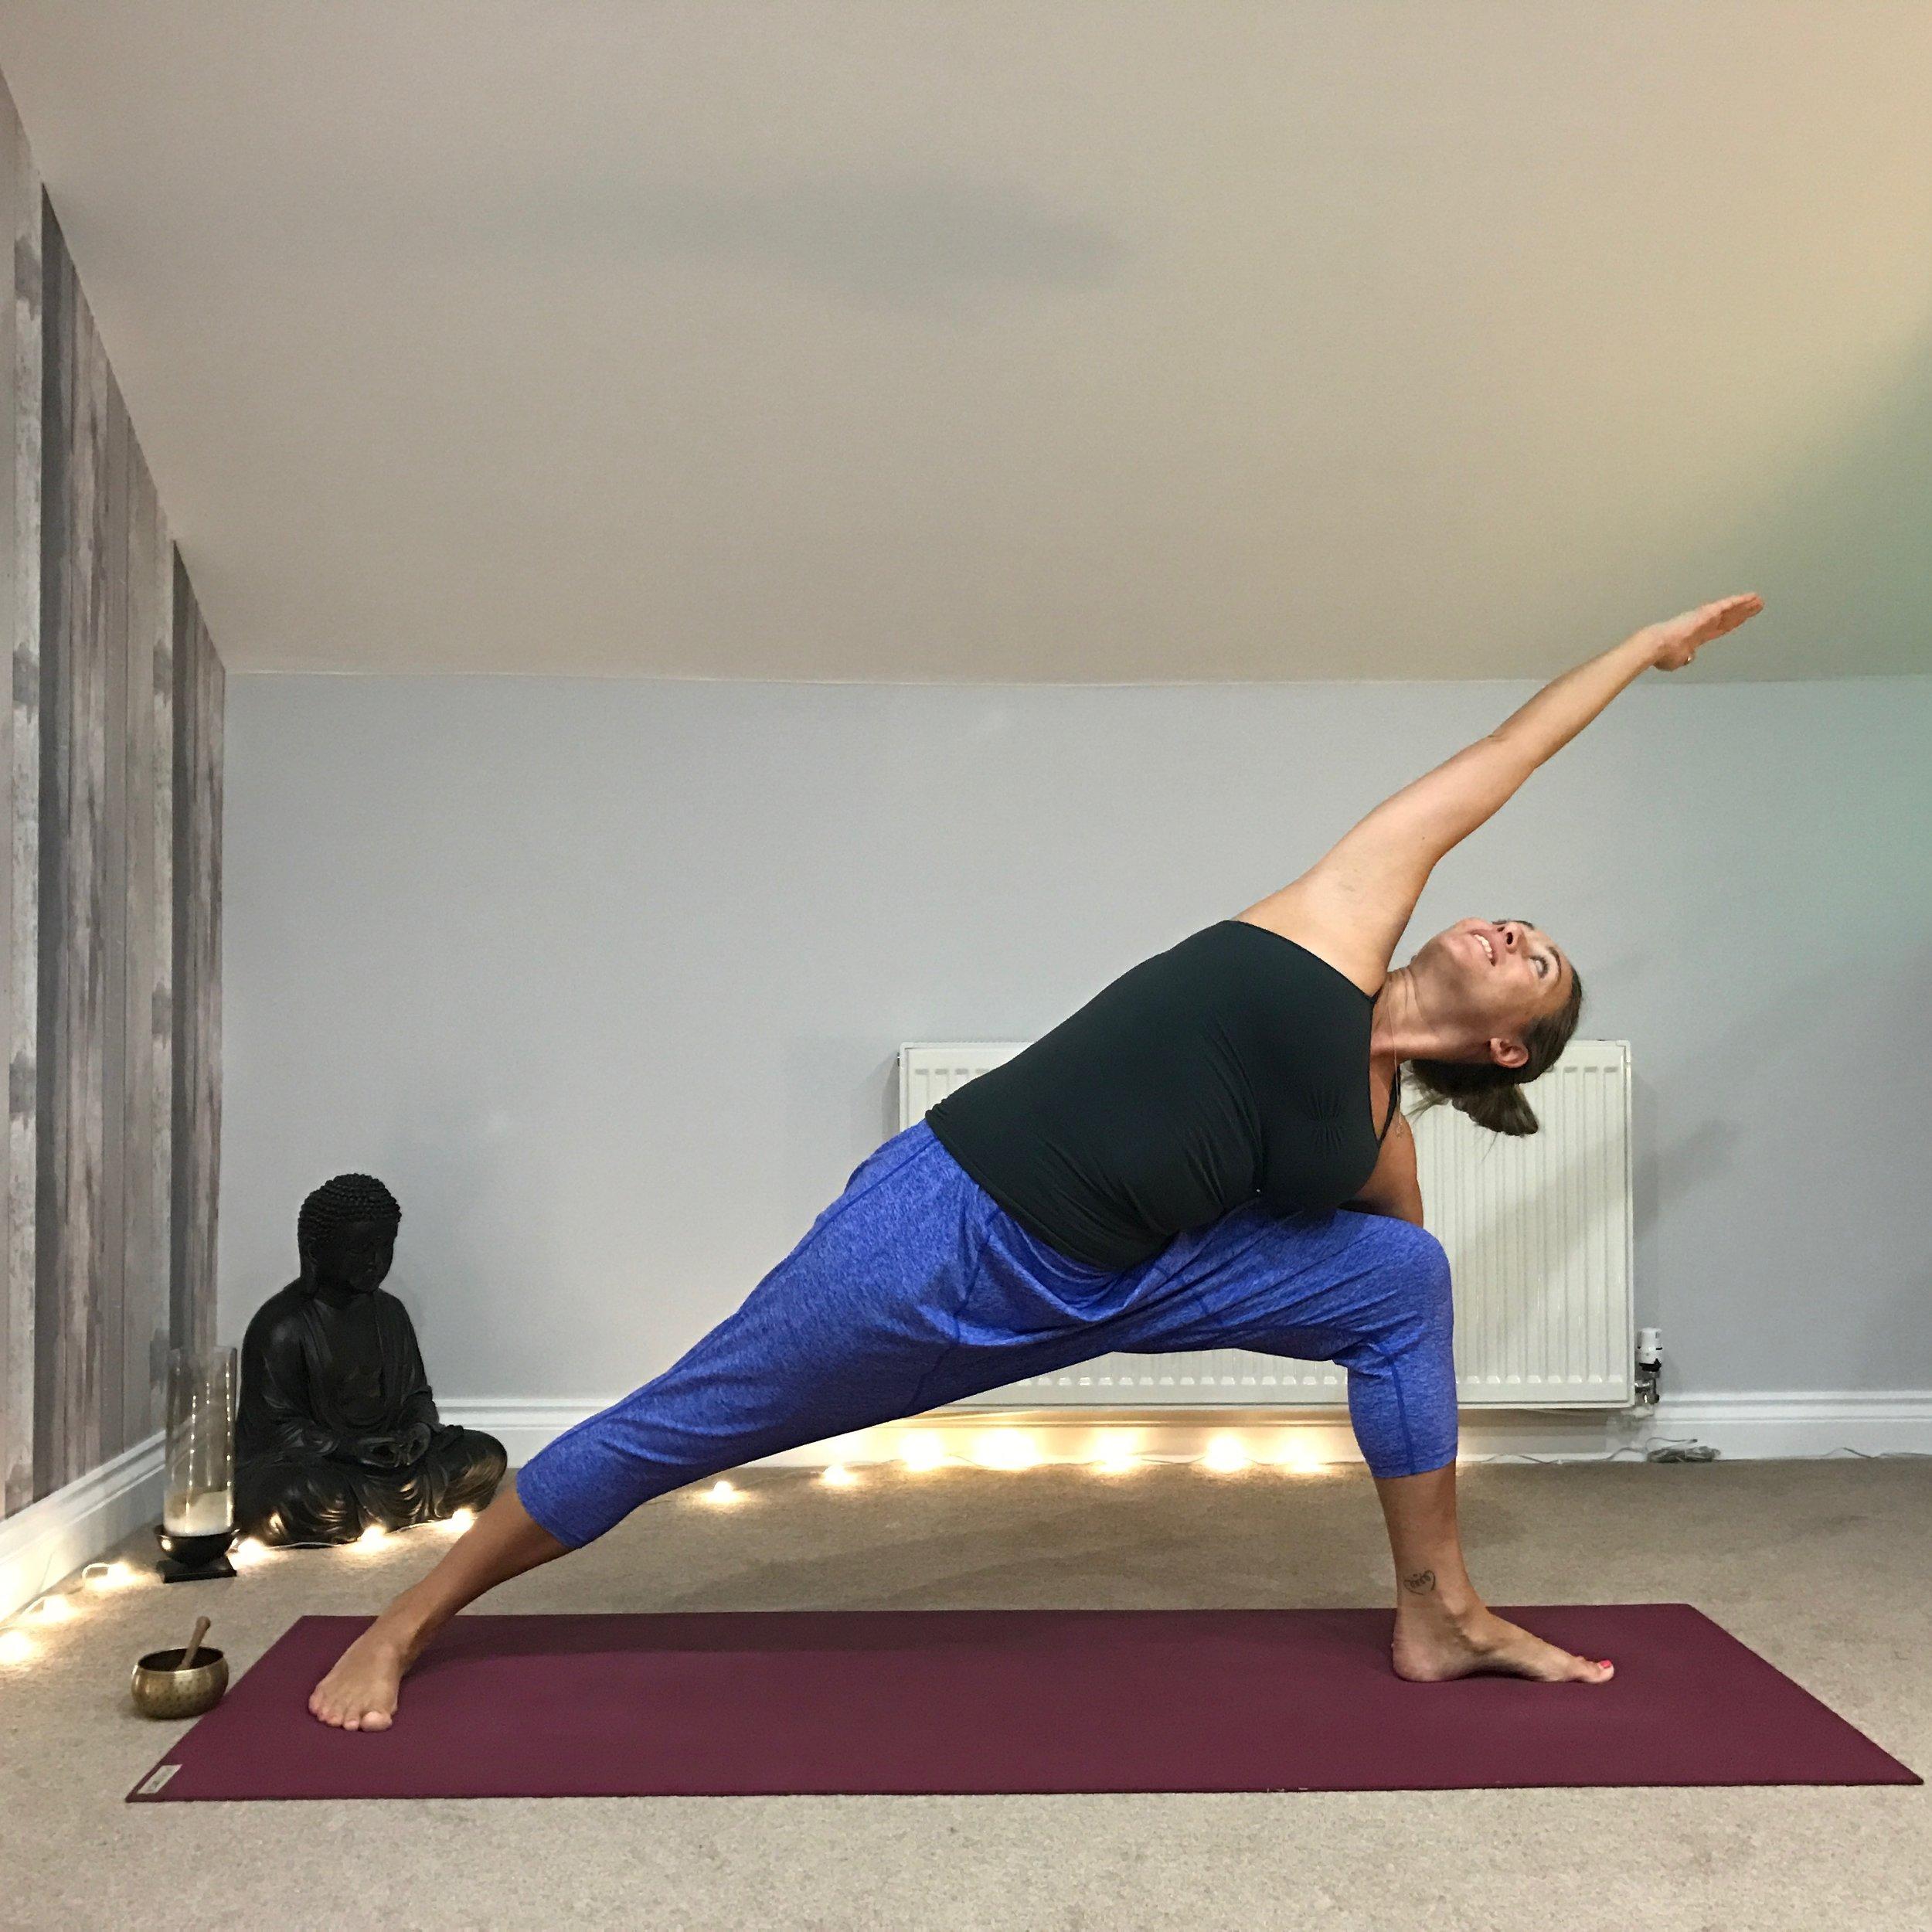 Beginning a yoga practice